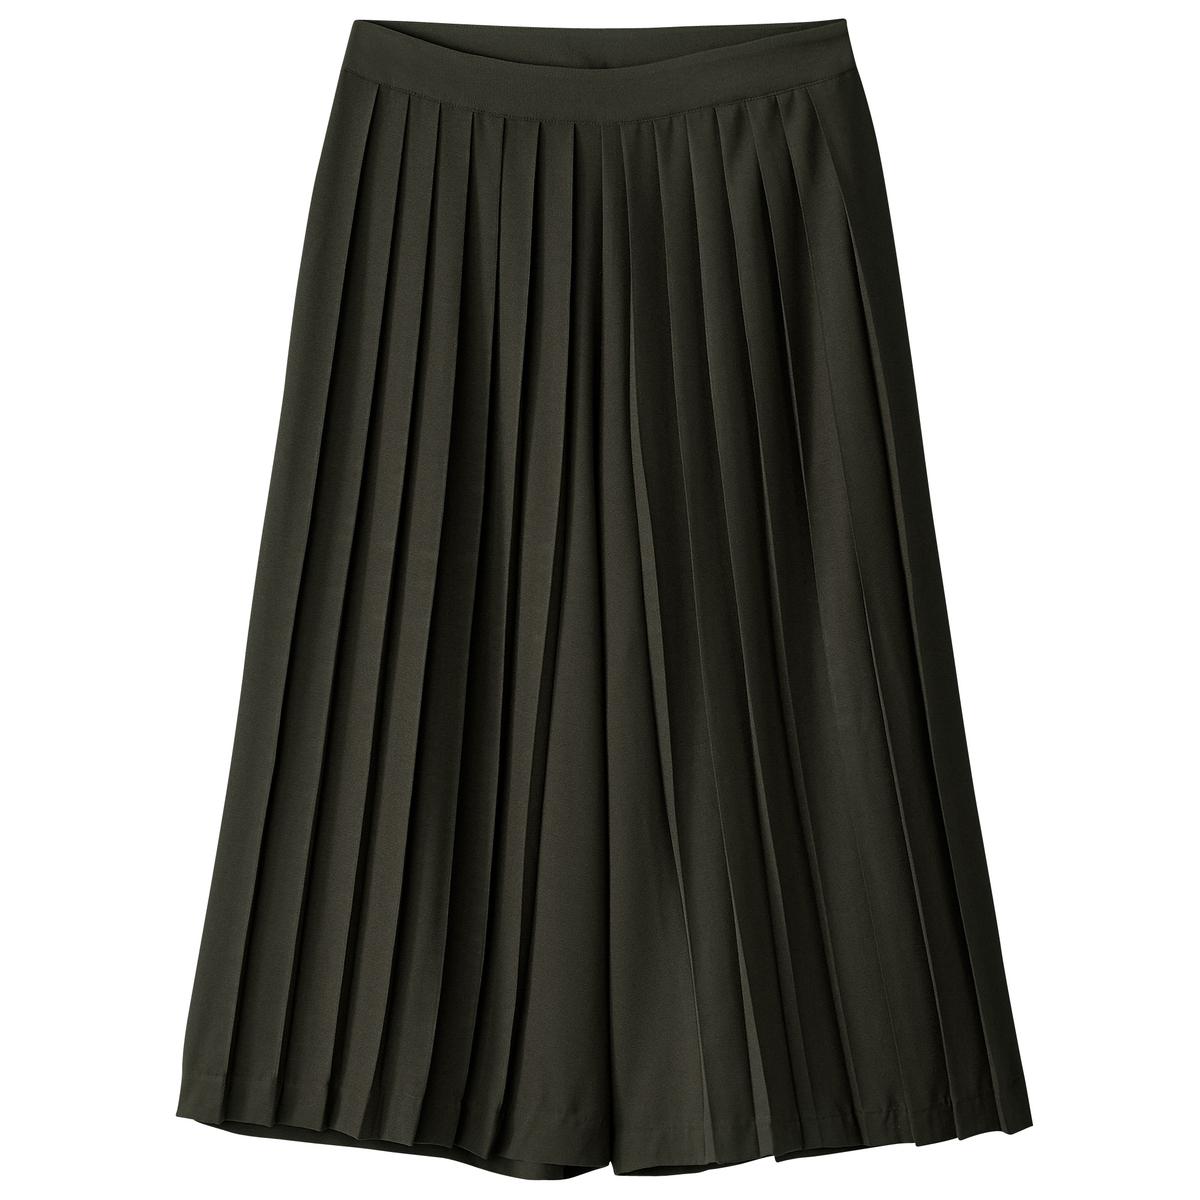 Pantaloni a pinocchietto larghi plissé